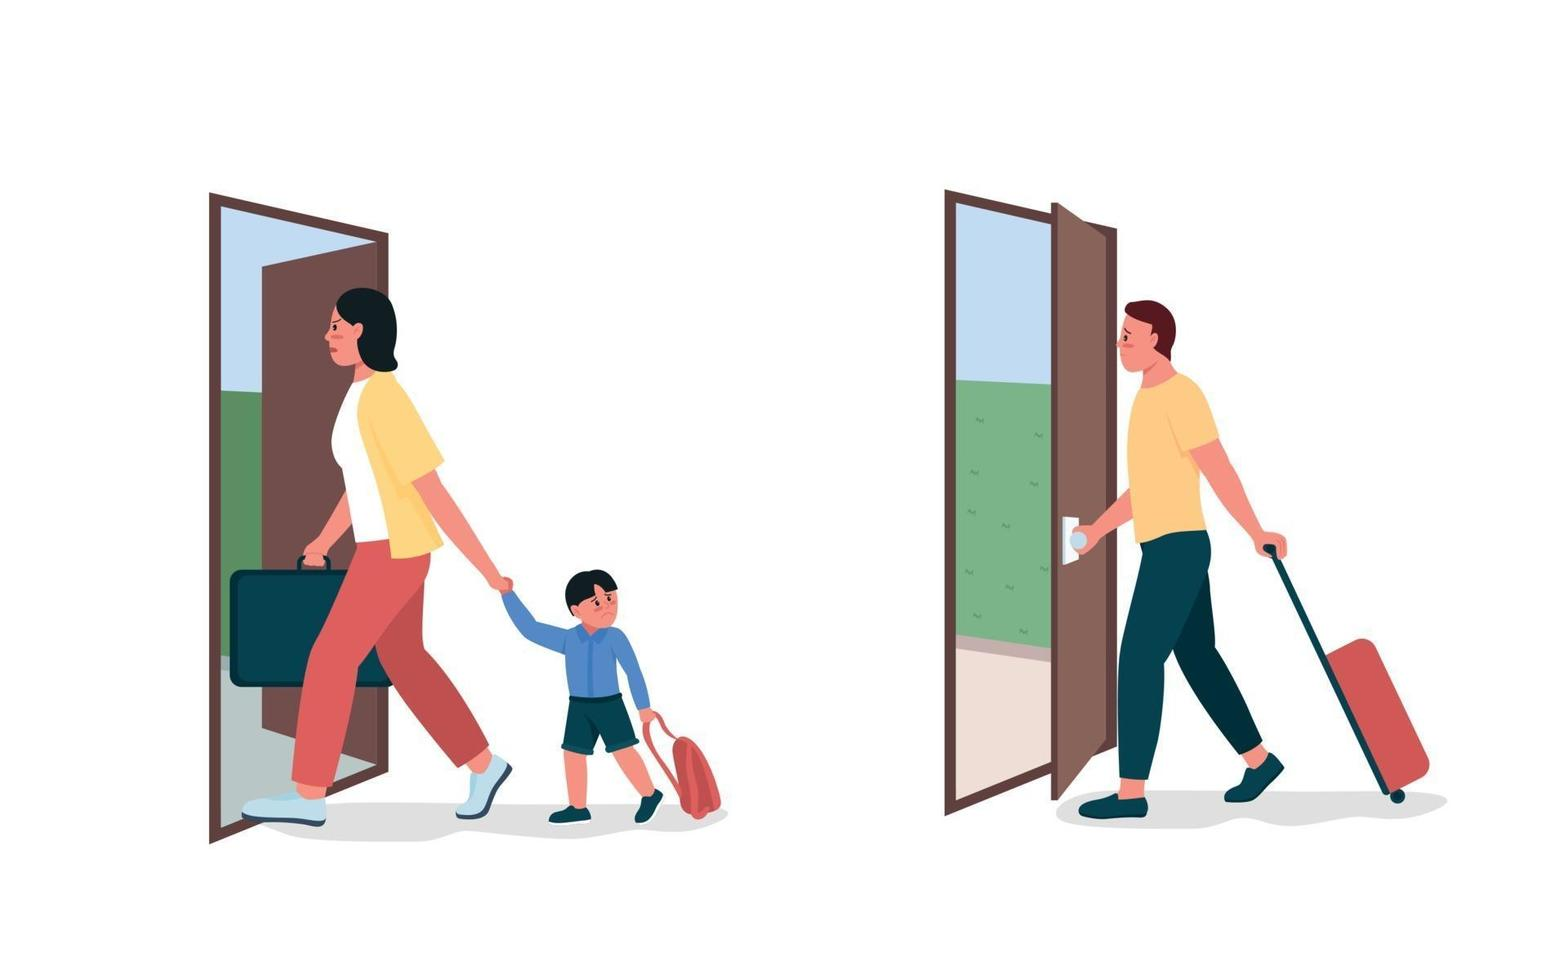 moeder, vader verlaat egale kleur vector gedetailleerde tekenset